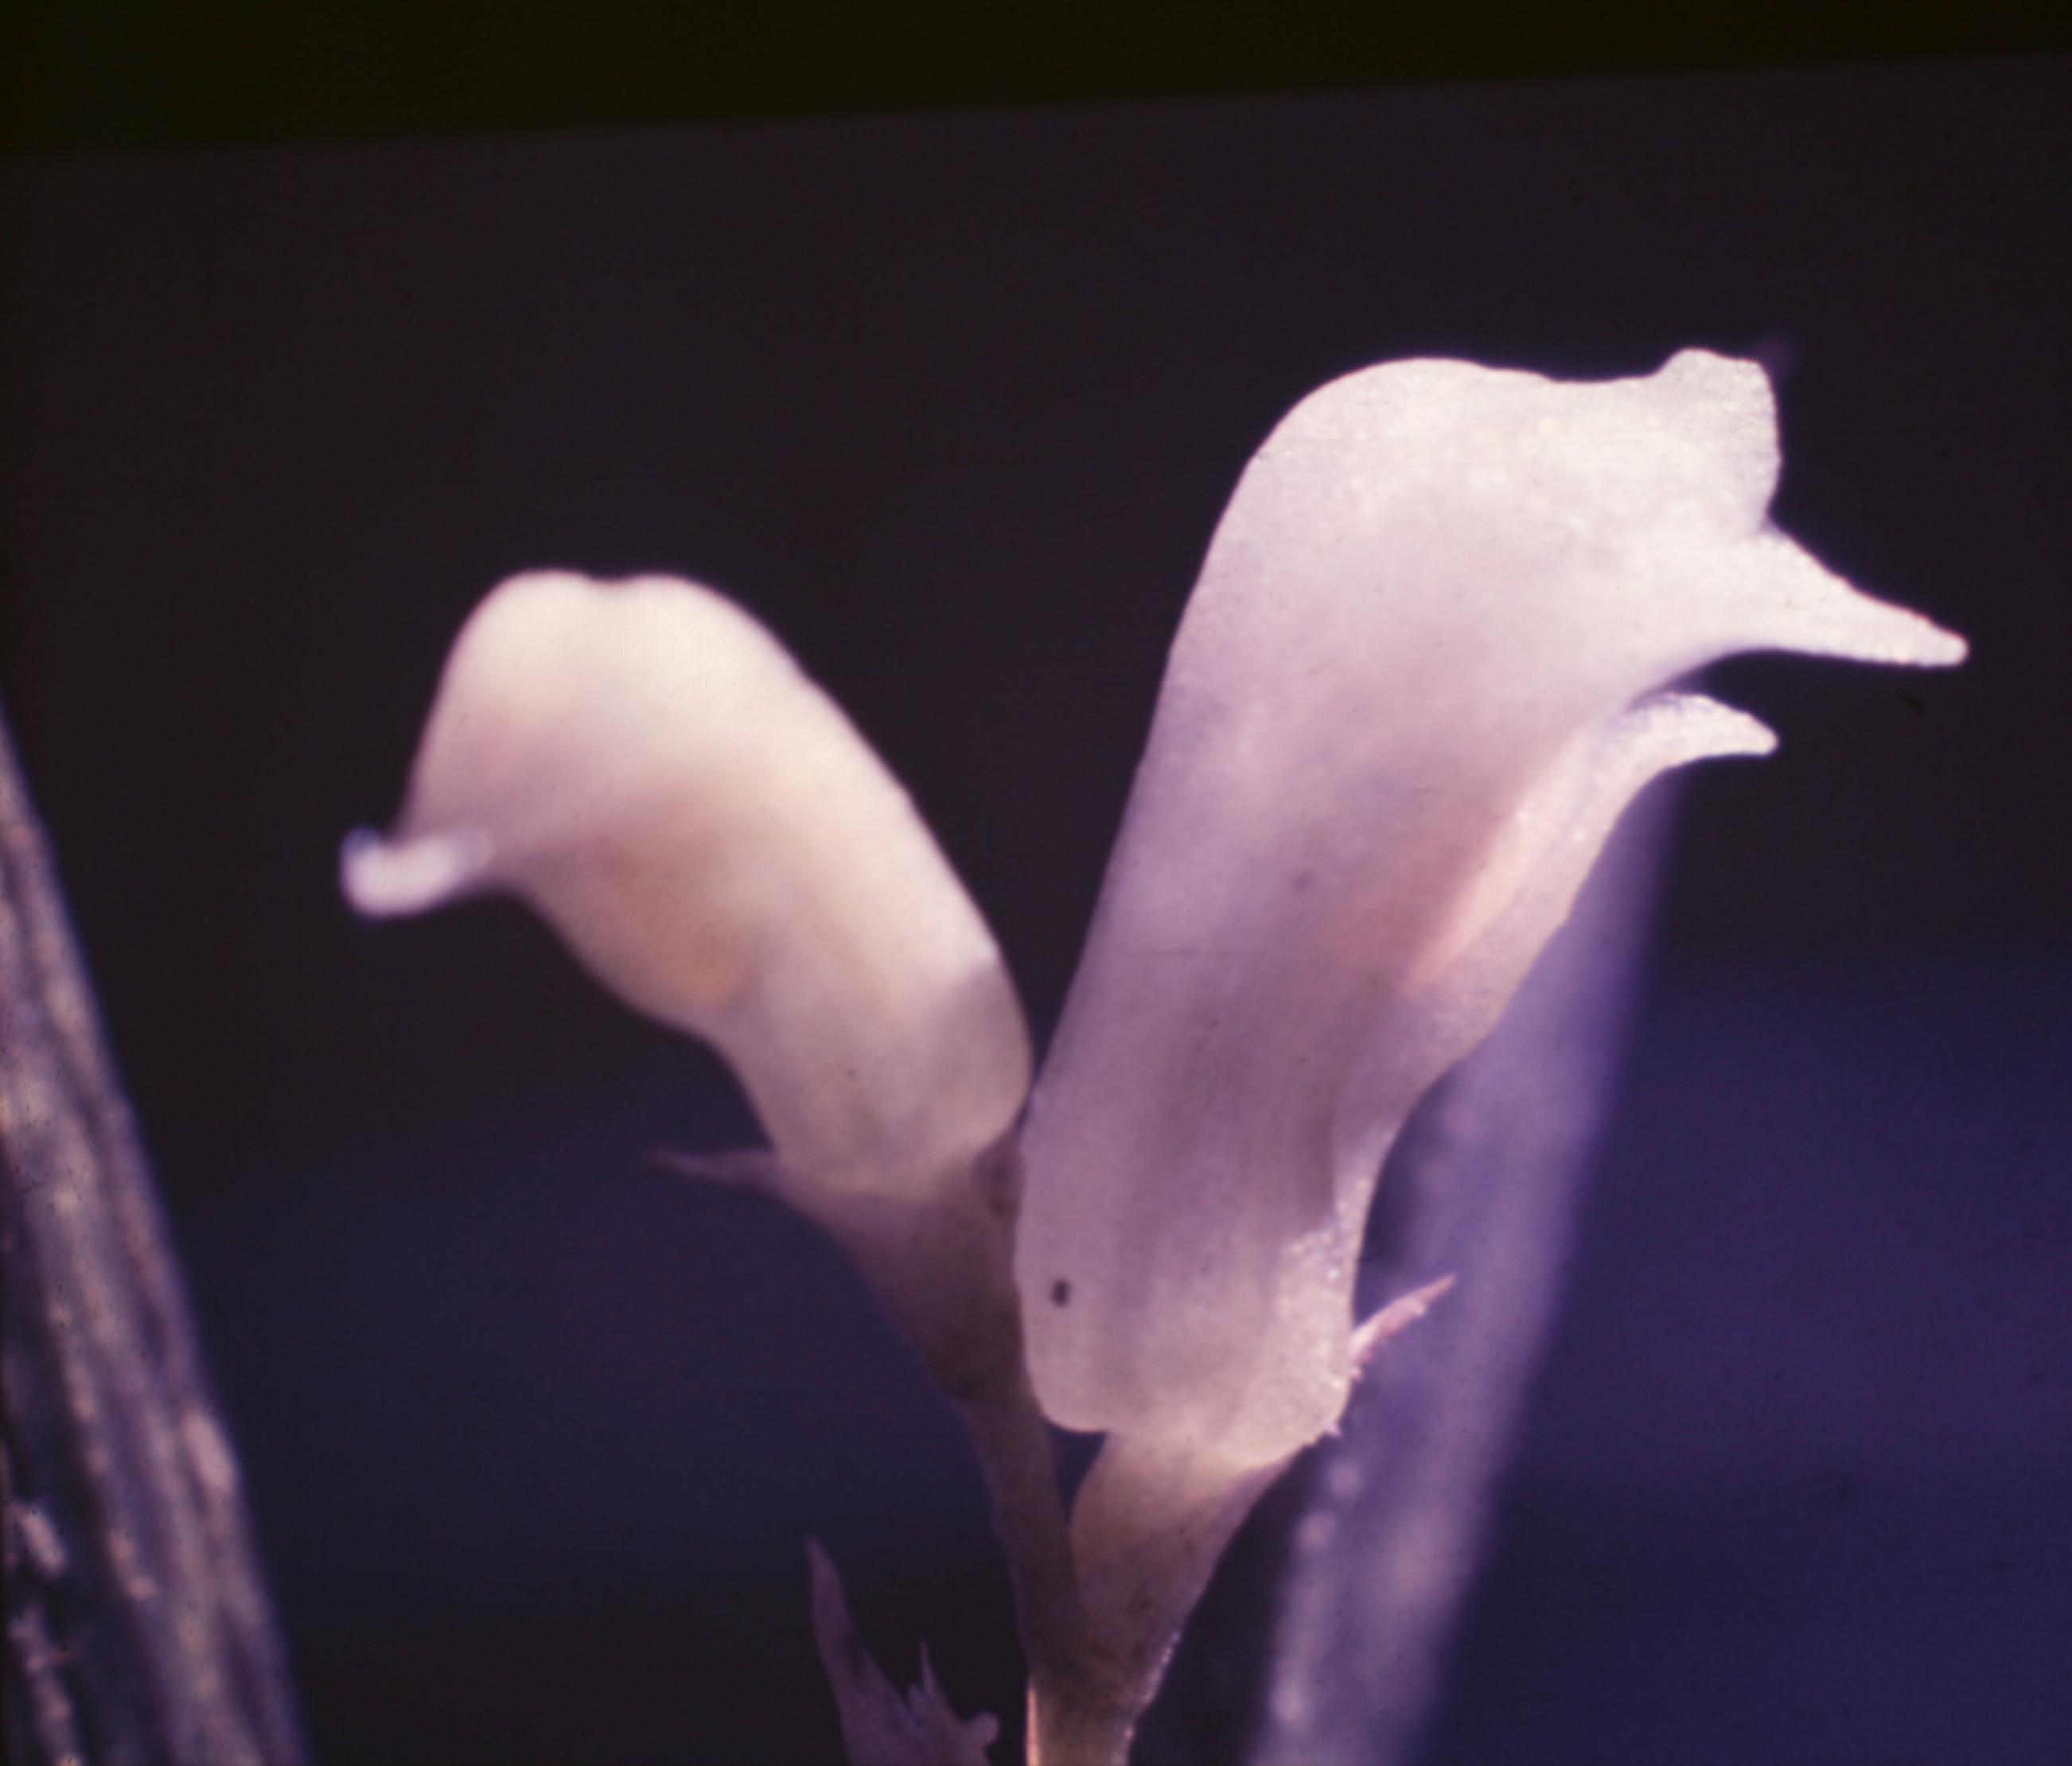 Image of Quekettia